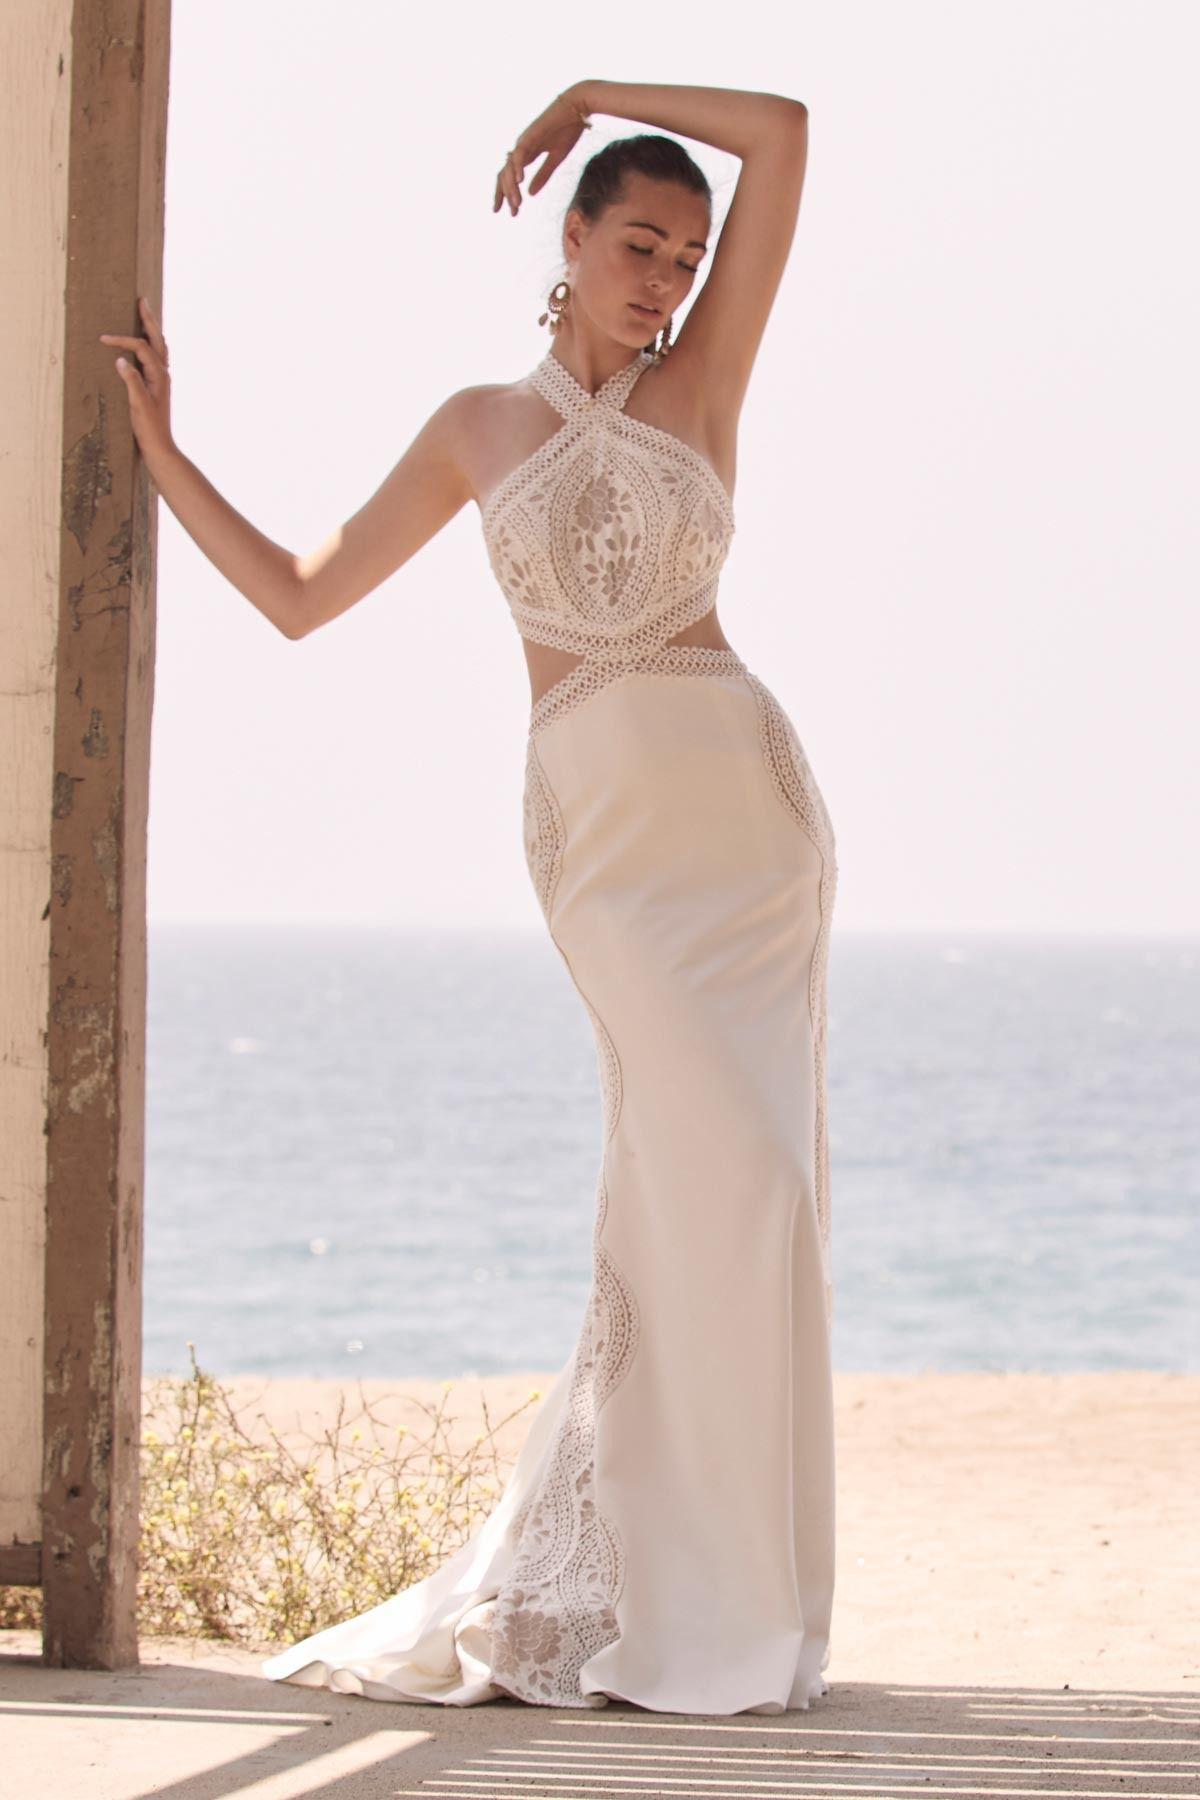 Willowy halter neck wedding dress in ivory